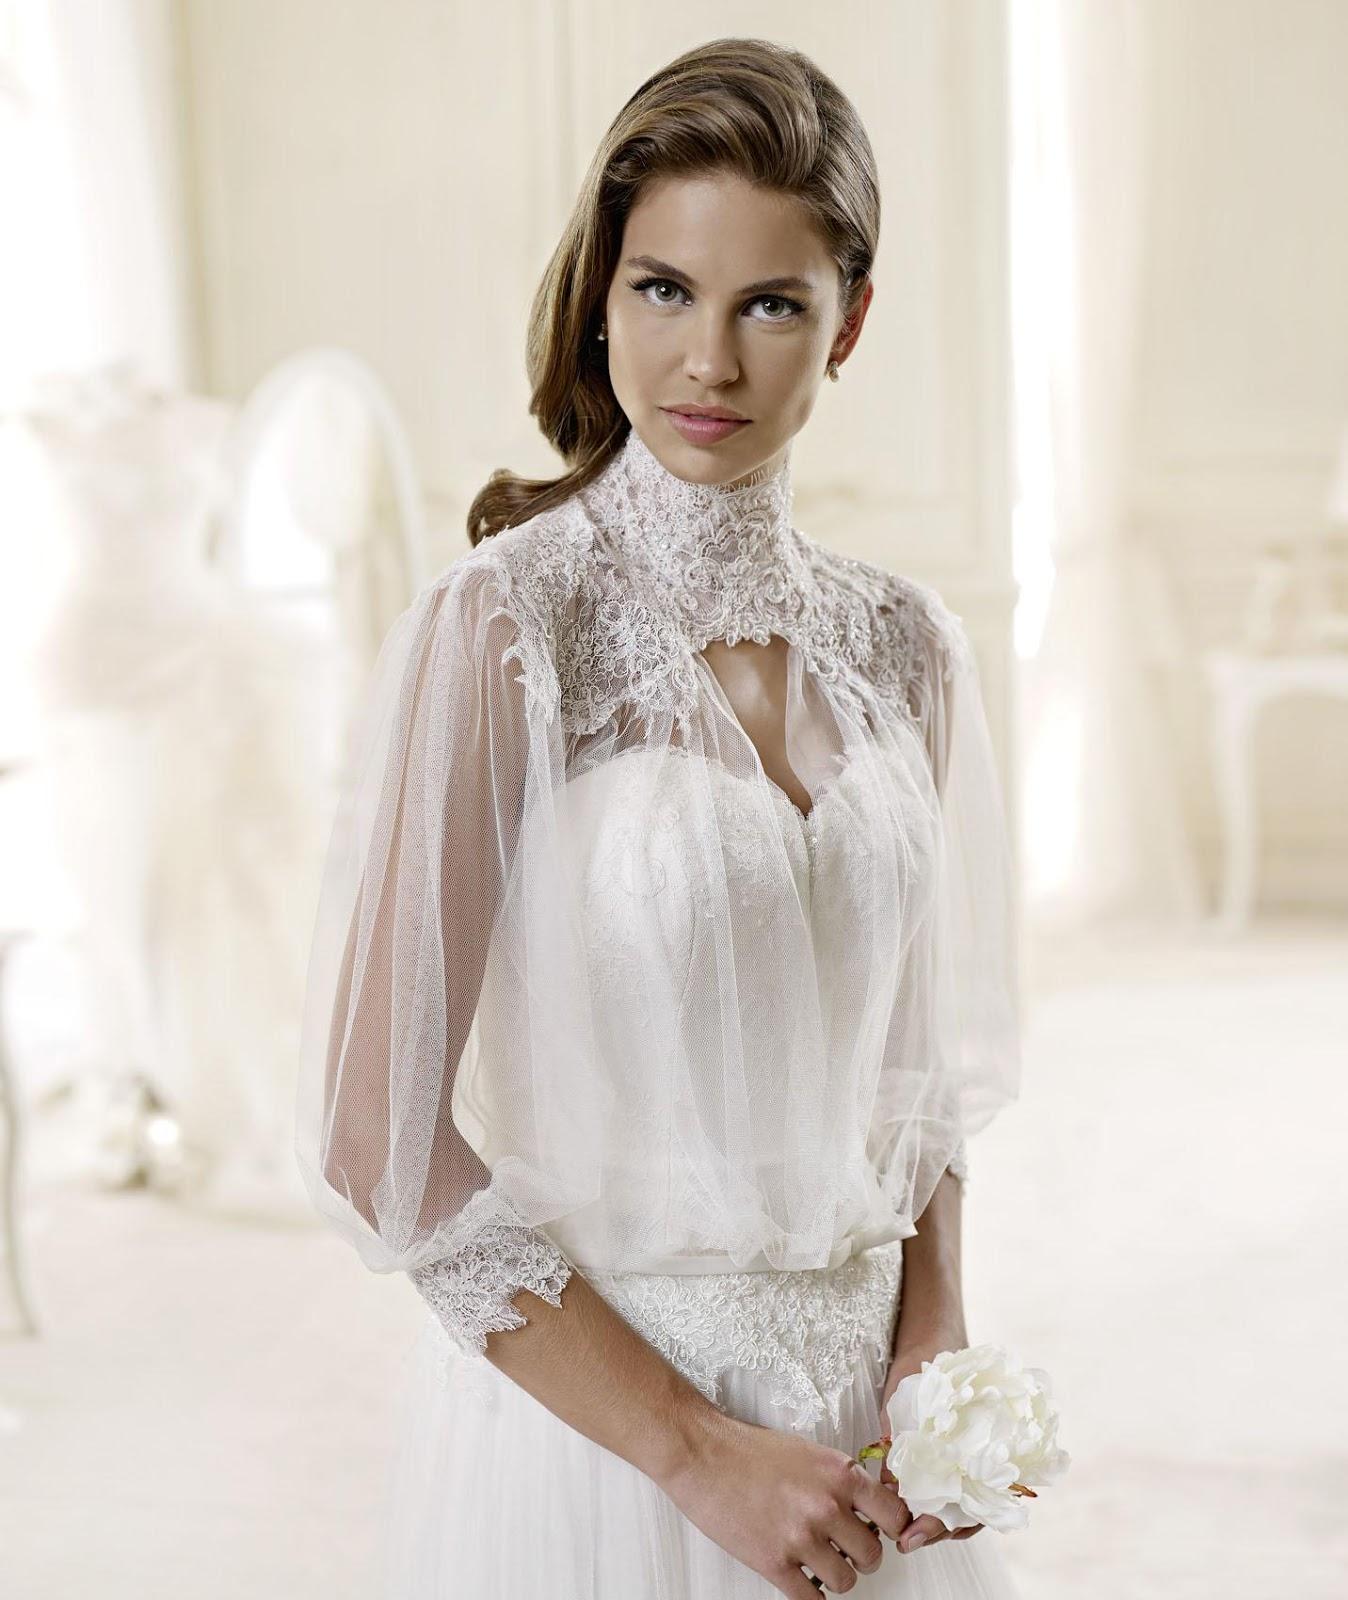 http://www.aislestyle.co.uk/elegant-aline-high-neck-beadingsequins-lace-sweepbrush-train-tulle-wedding-dresses-p-2755.html